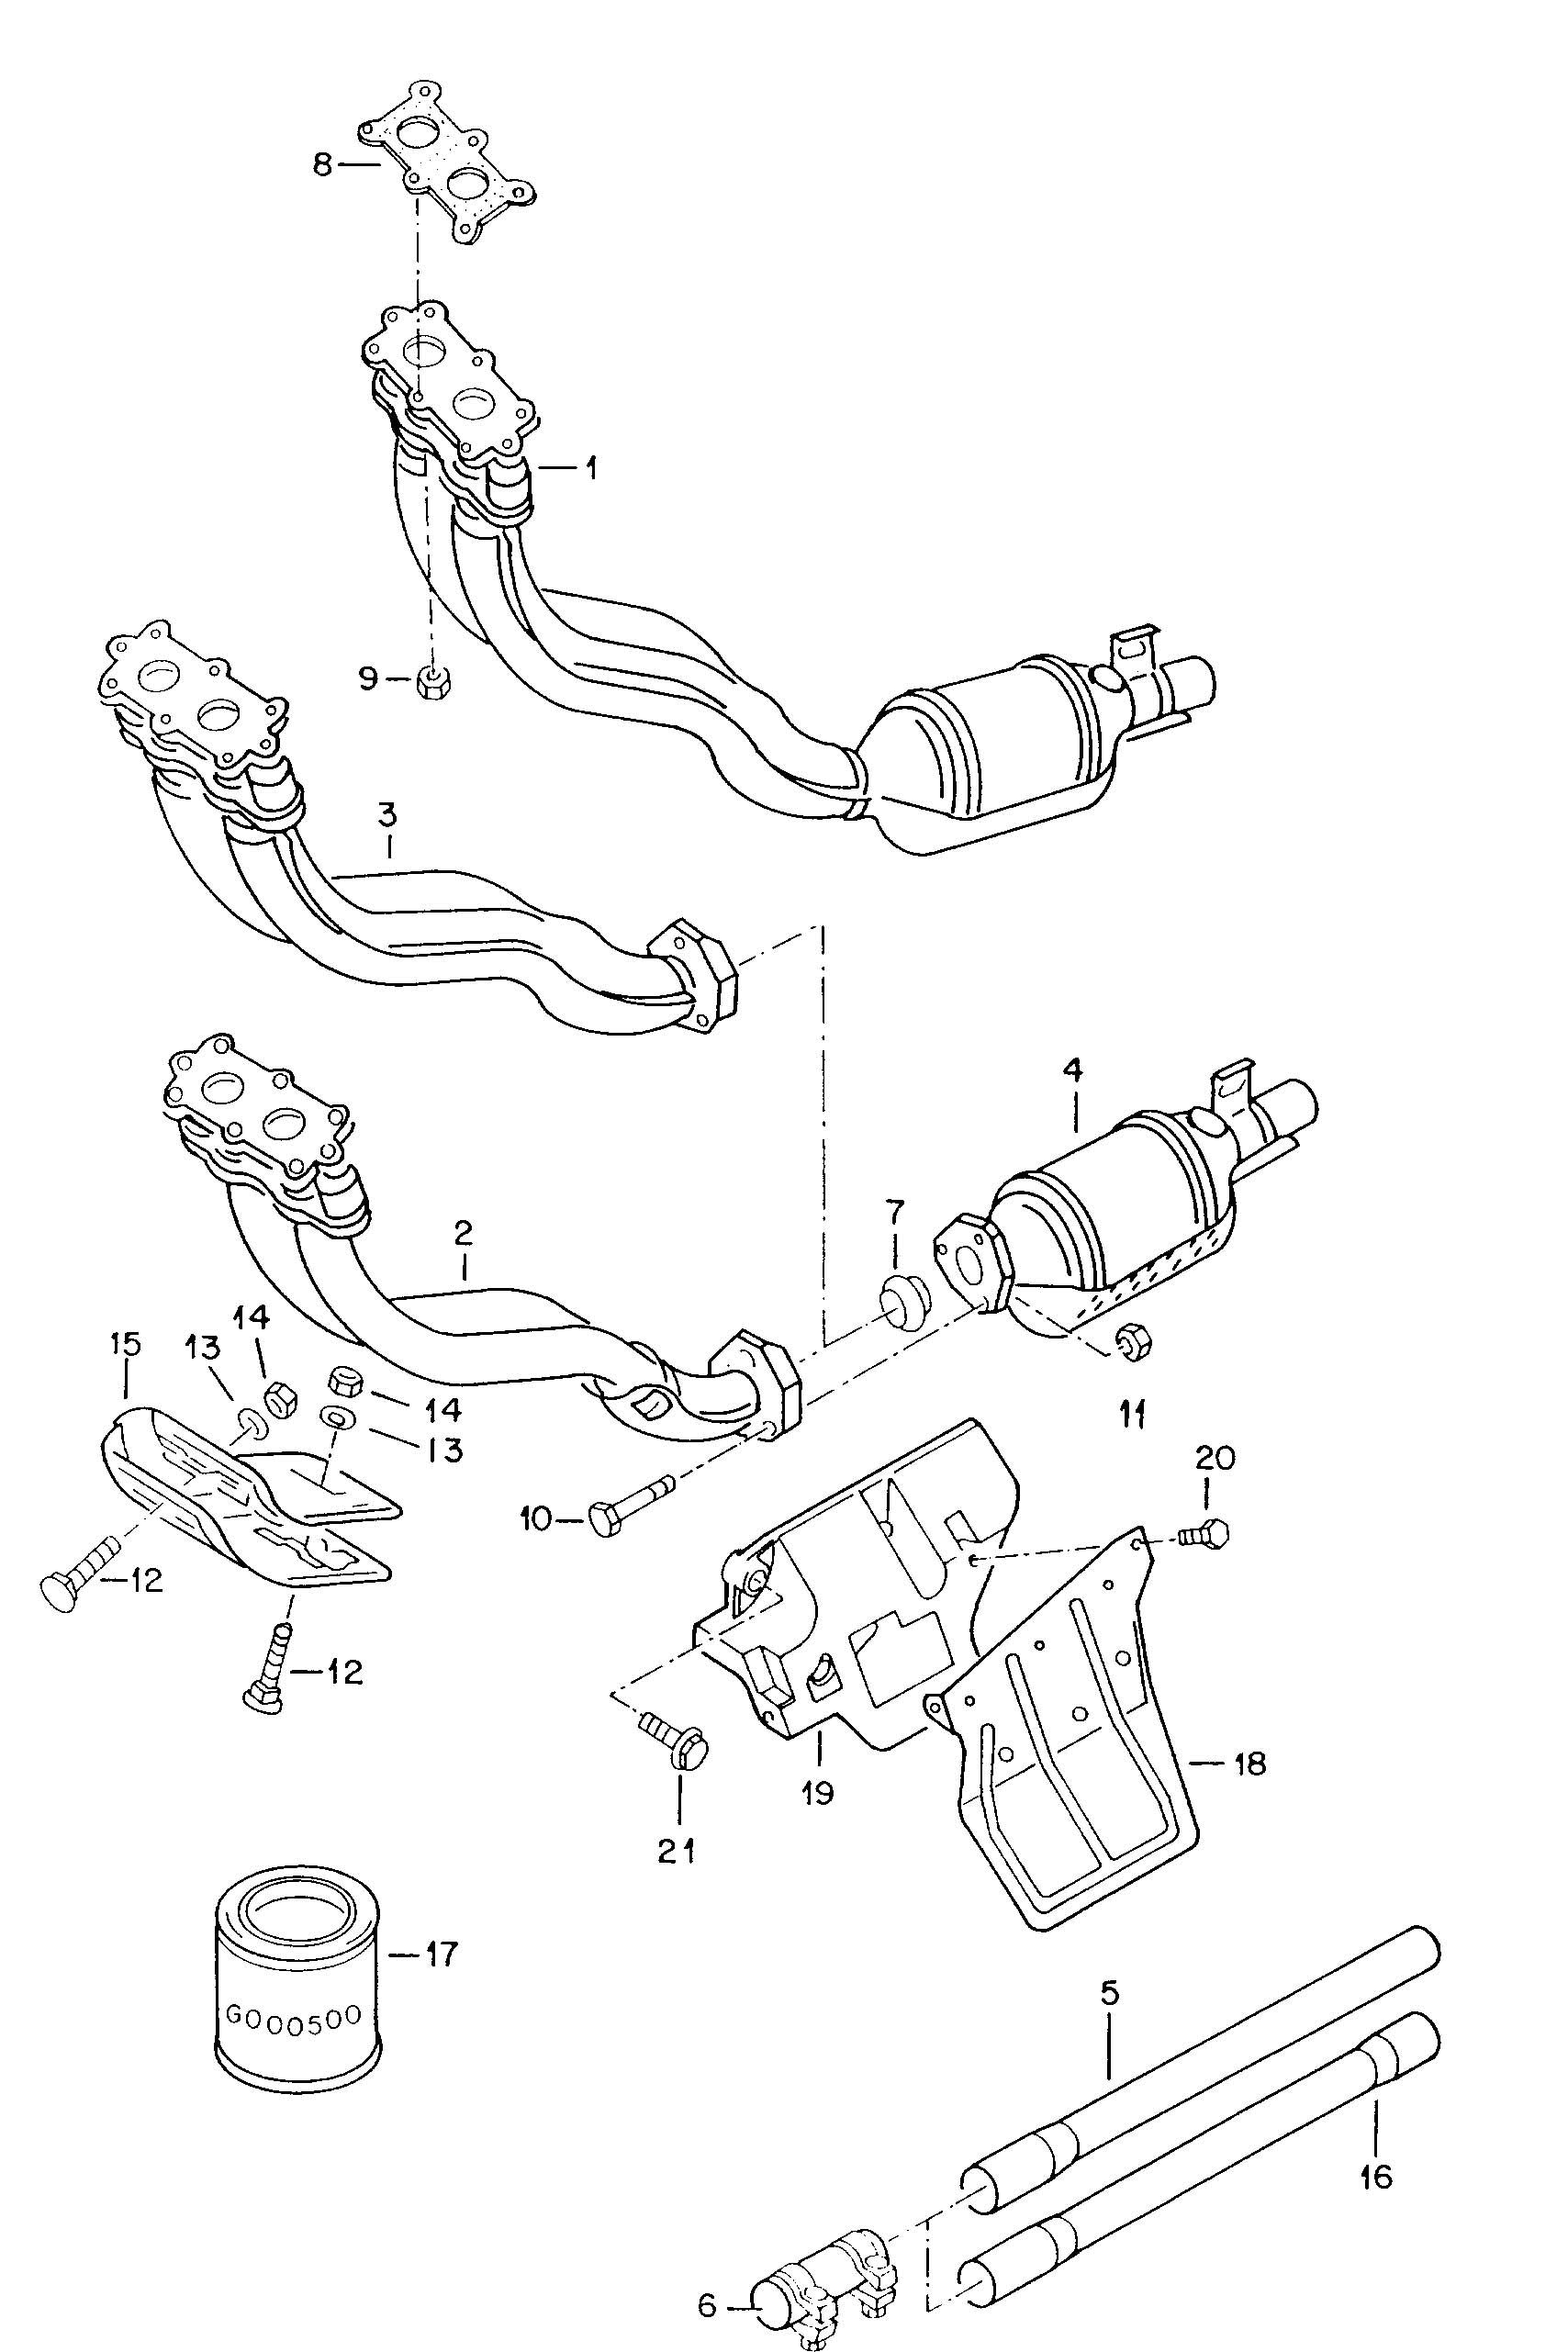 2012 ford f350 serpentine belt diagram additionally dodge sel serpentine belt diagram together with t24289352 belt